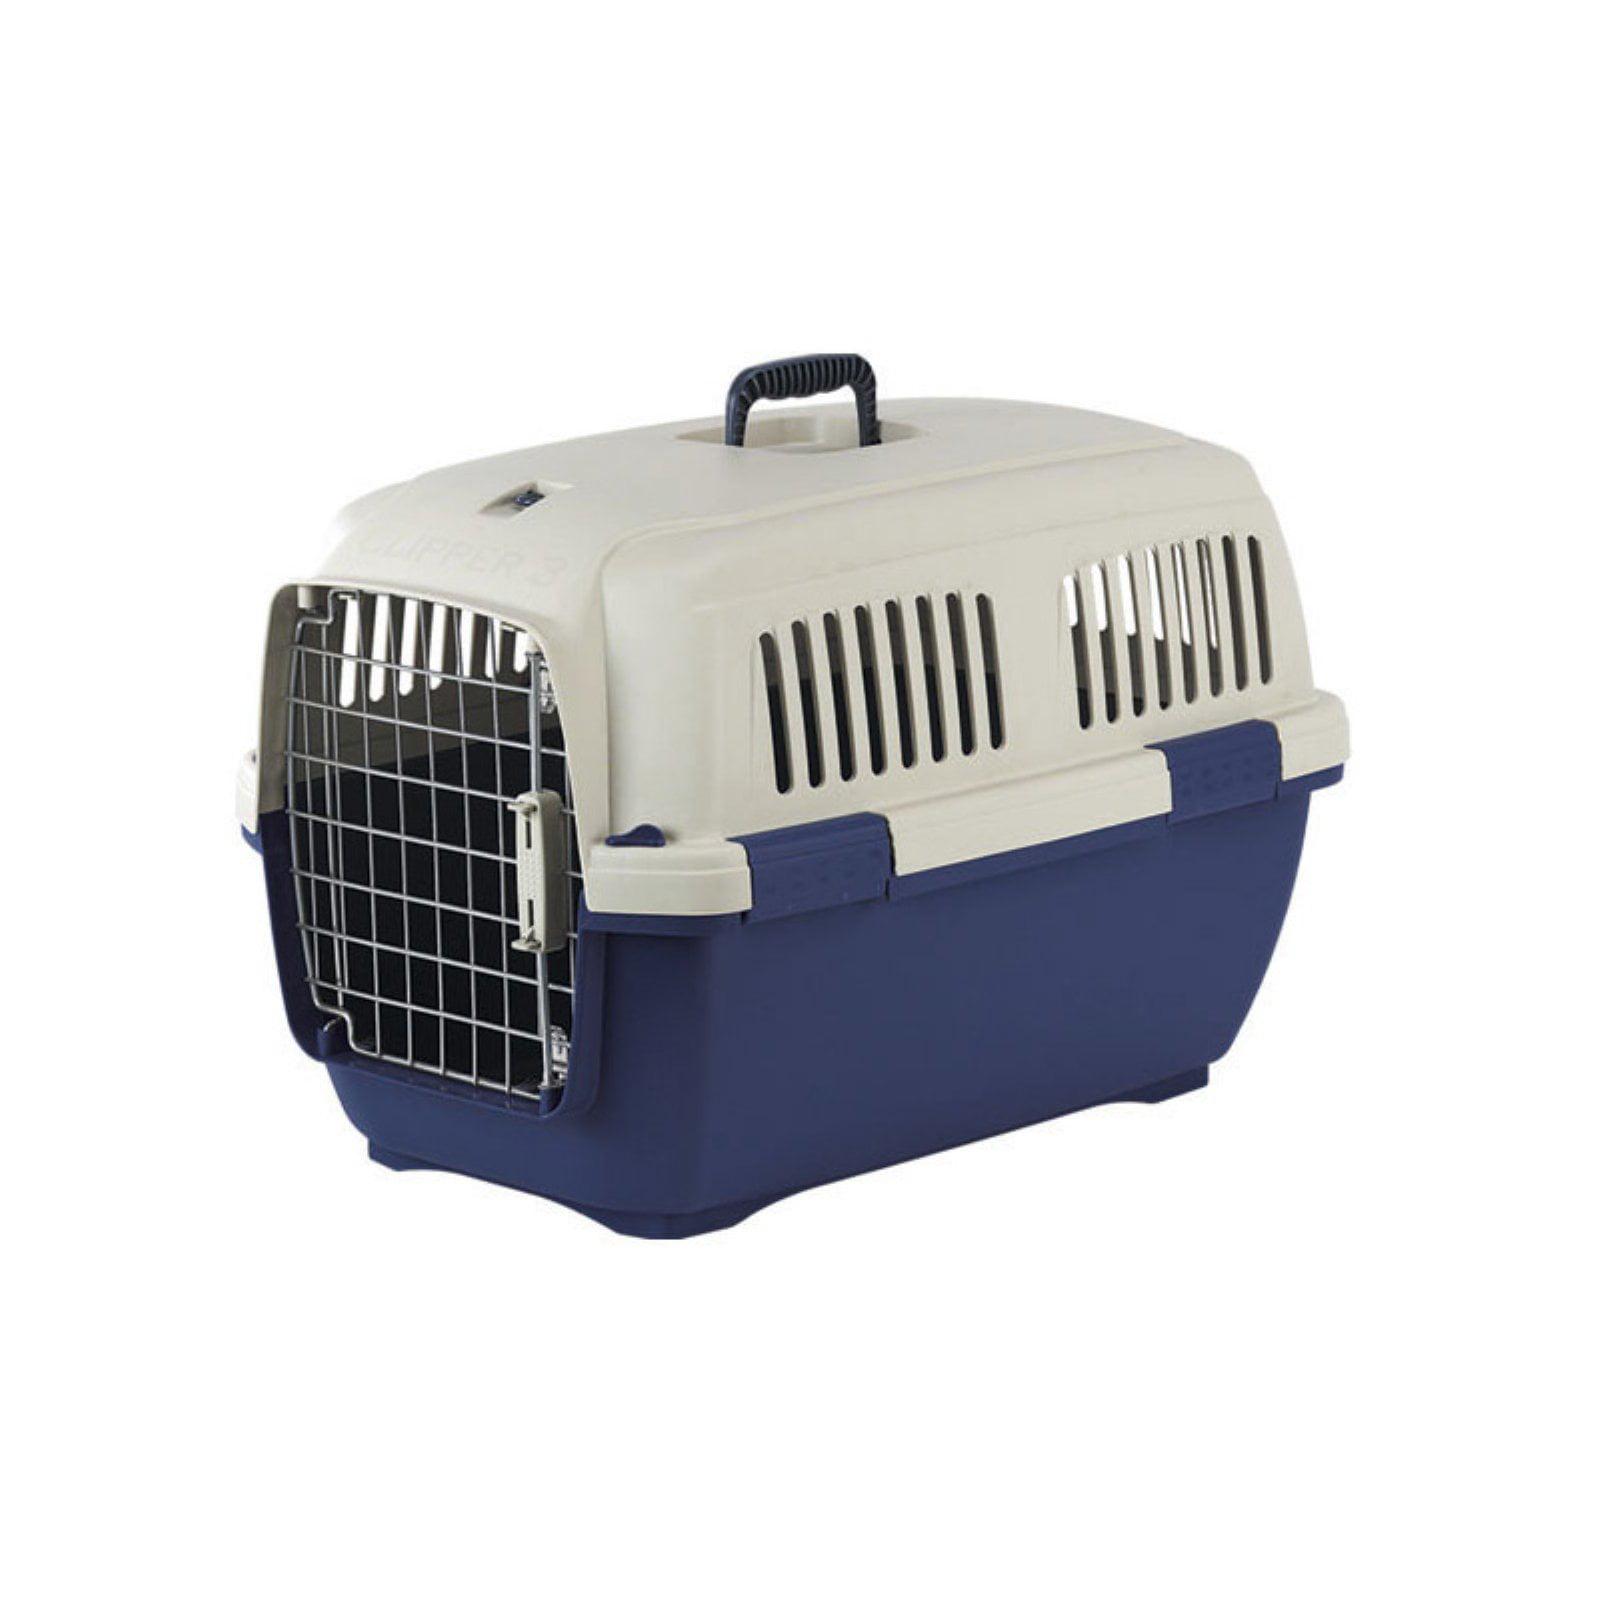 Clipper Cayman Plastic Pet Carrier